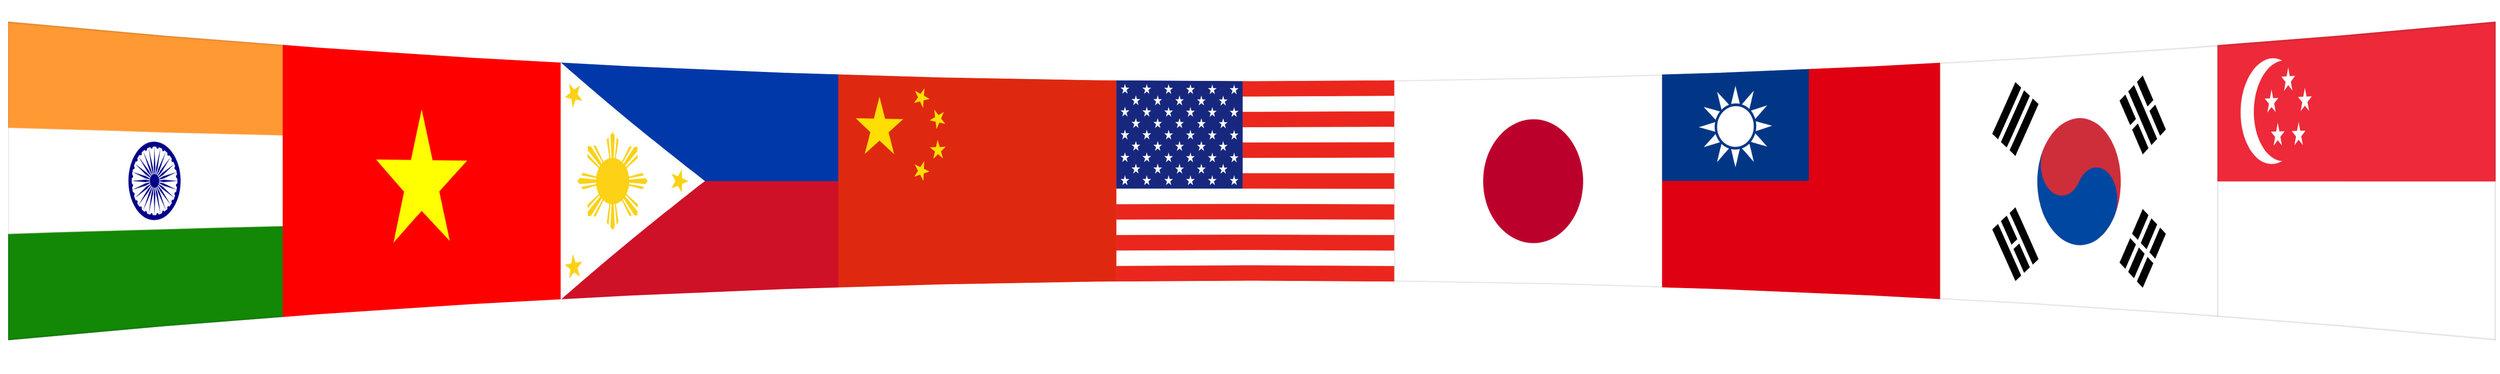 All_Flags_sized_Long.jpg